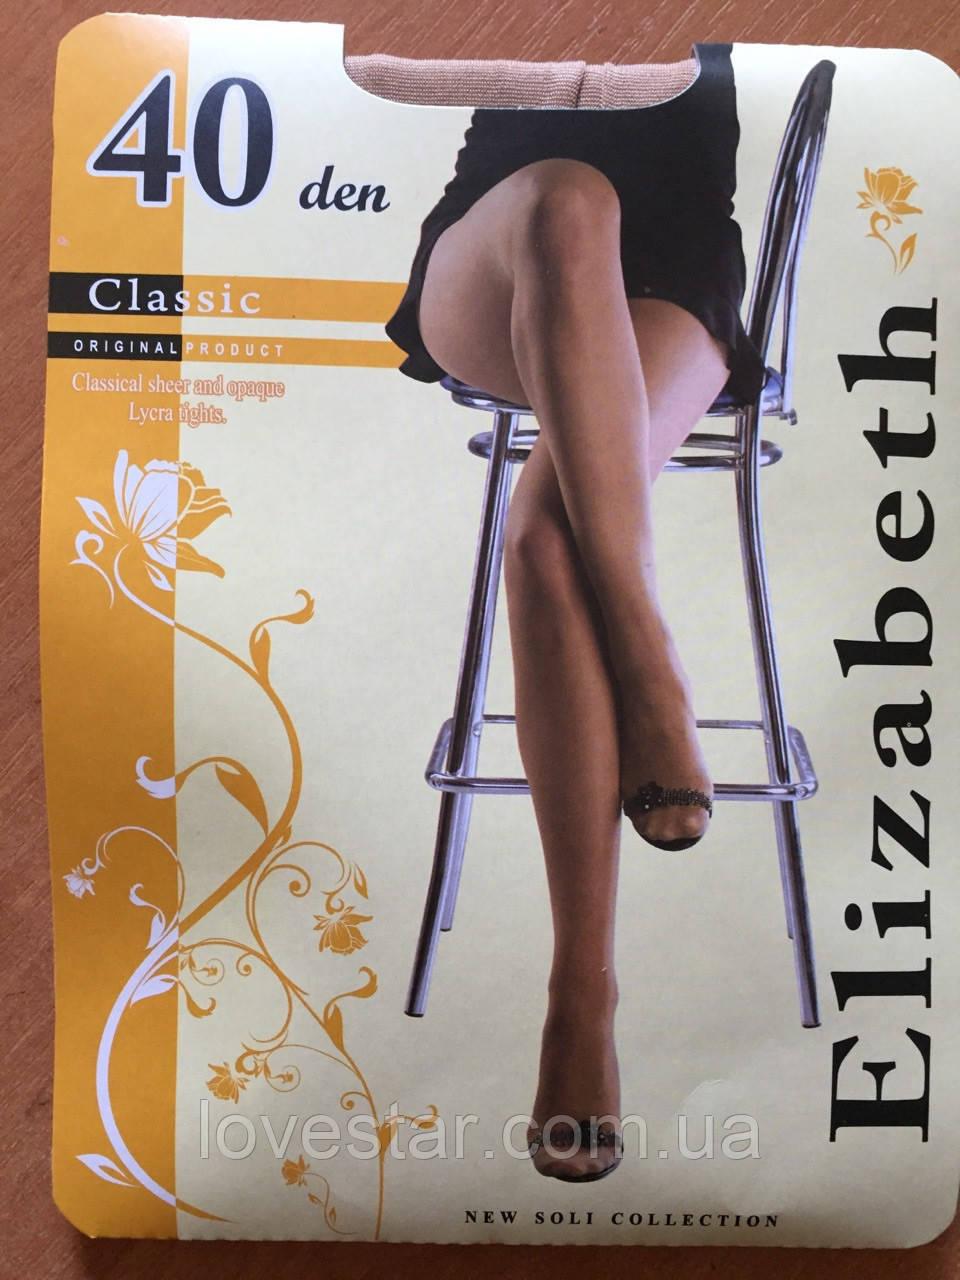 Колготки Elizabeth 40 den classic  4 беж